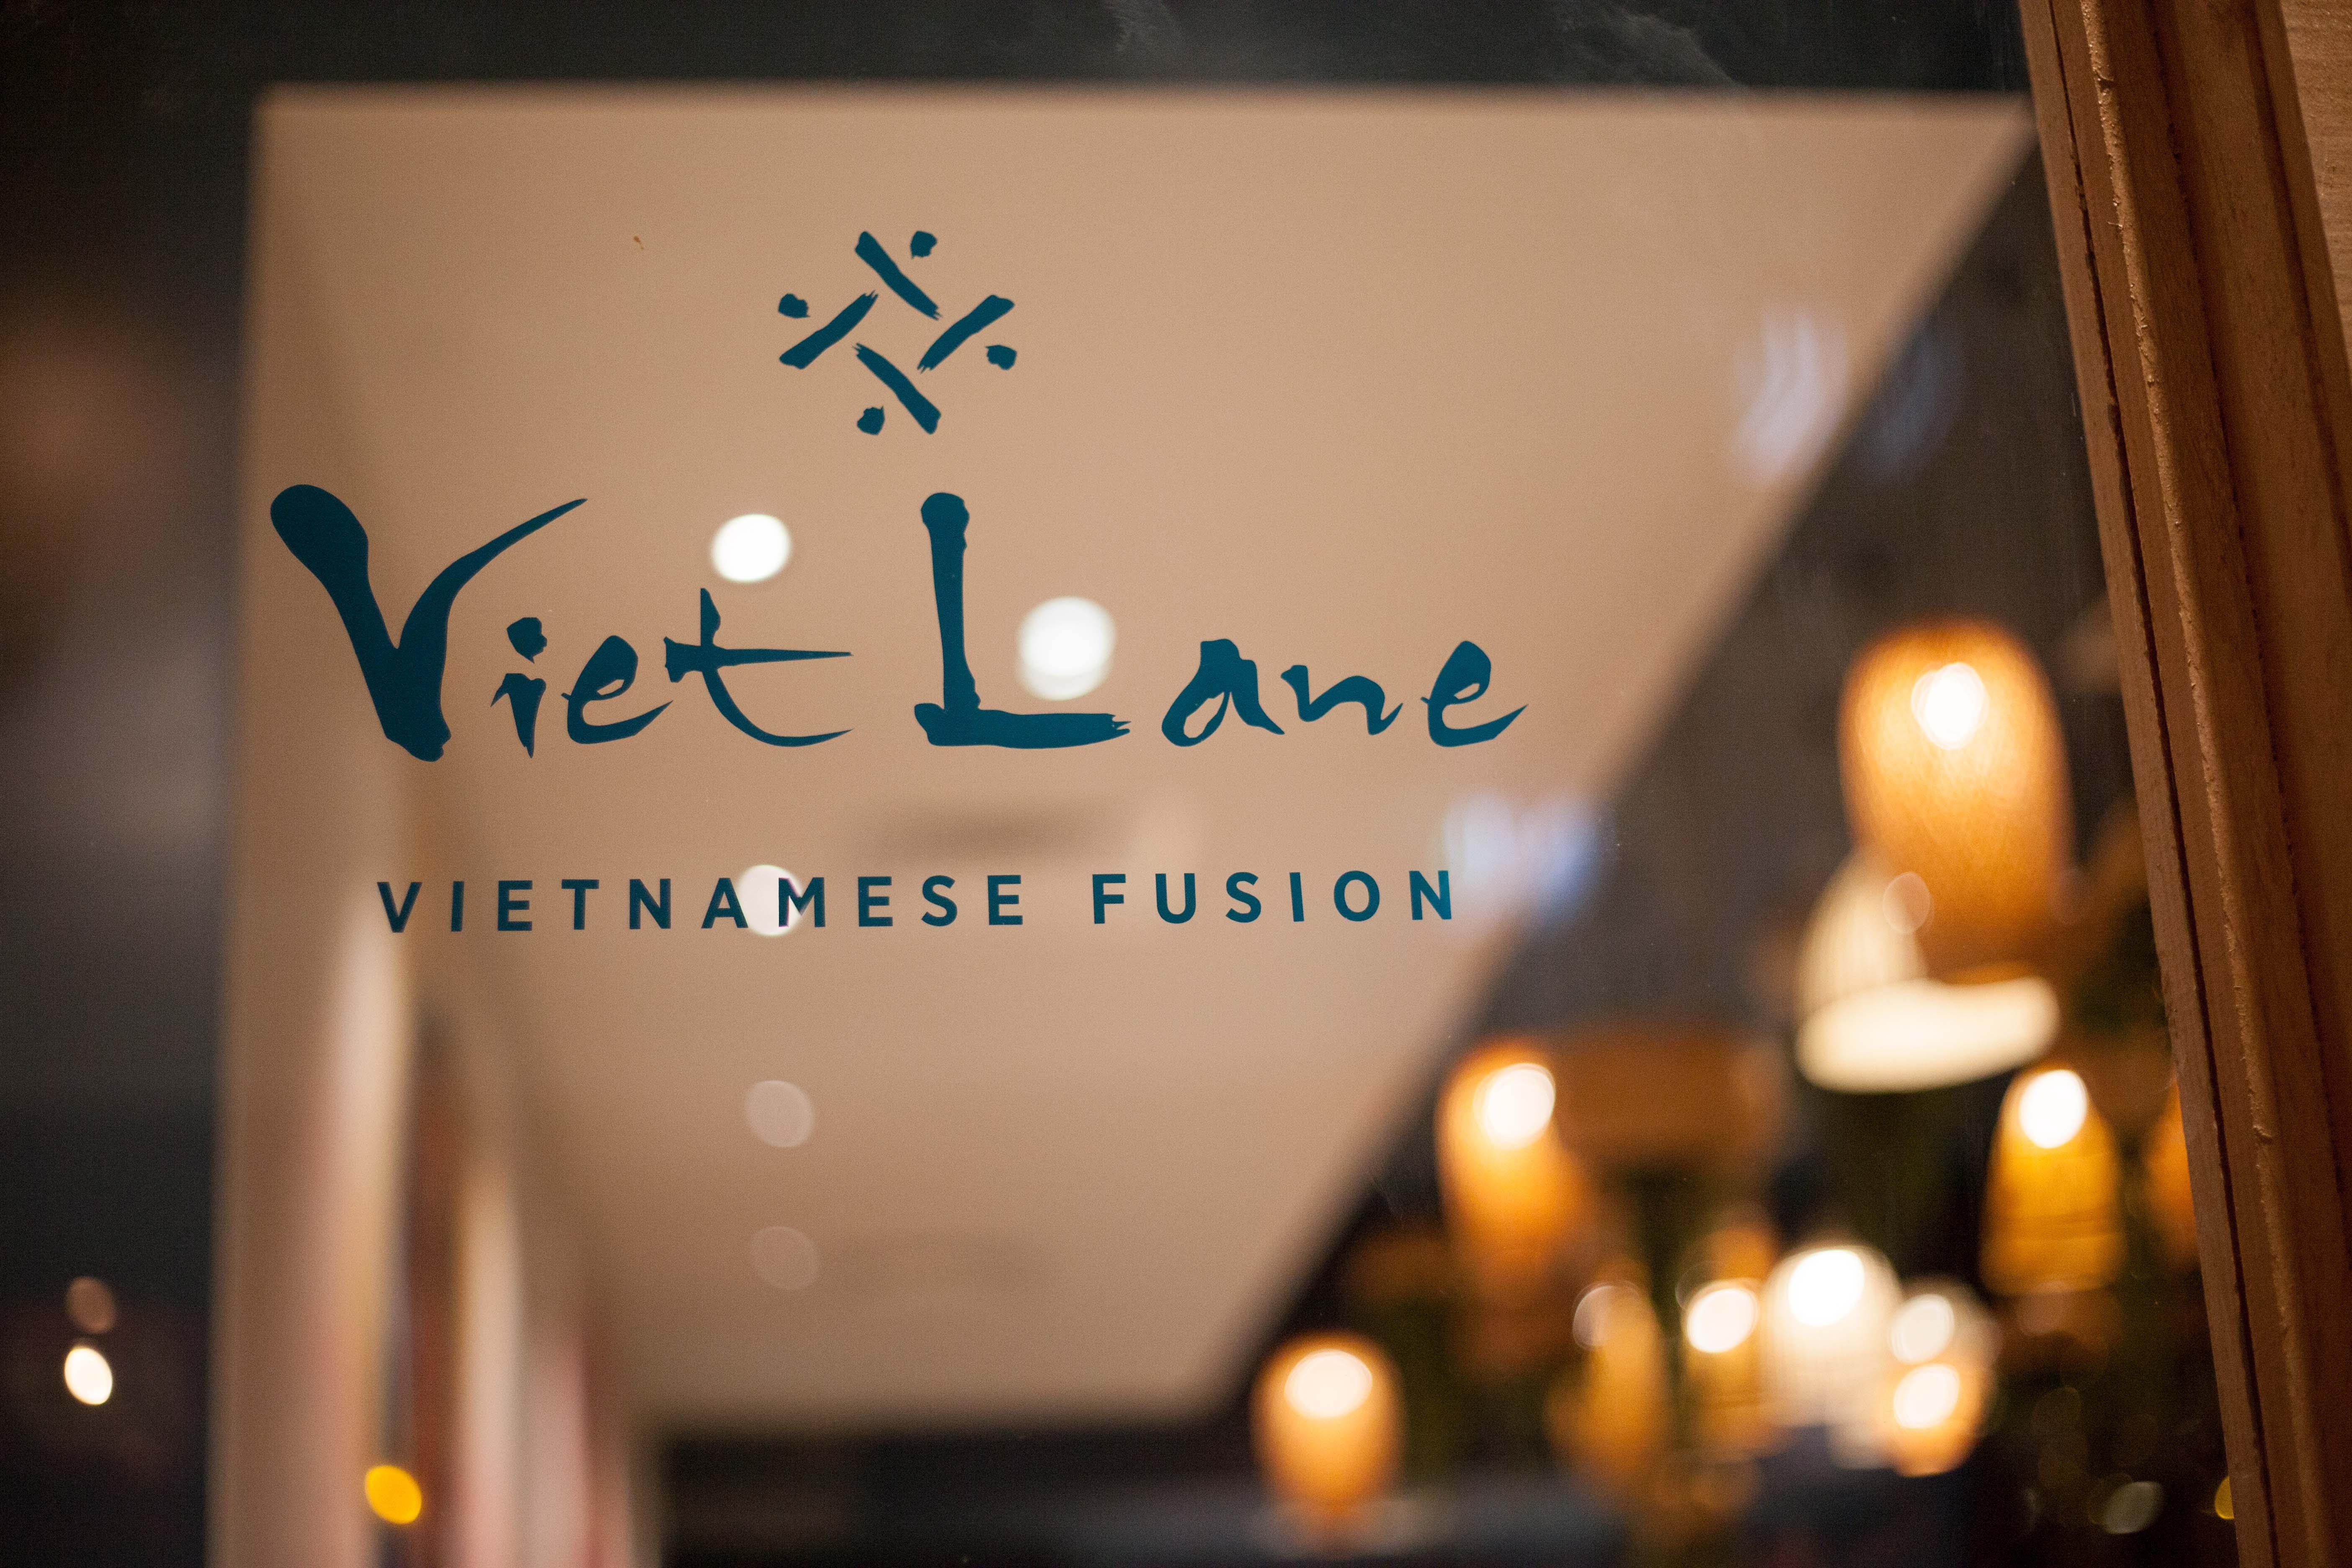 Viet Lane